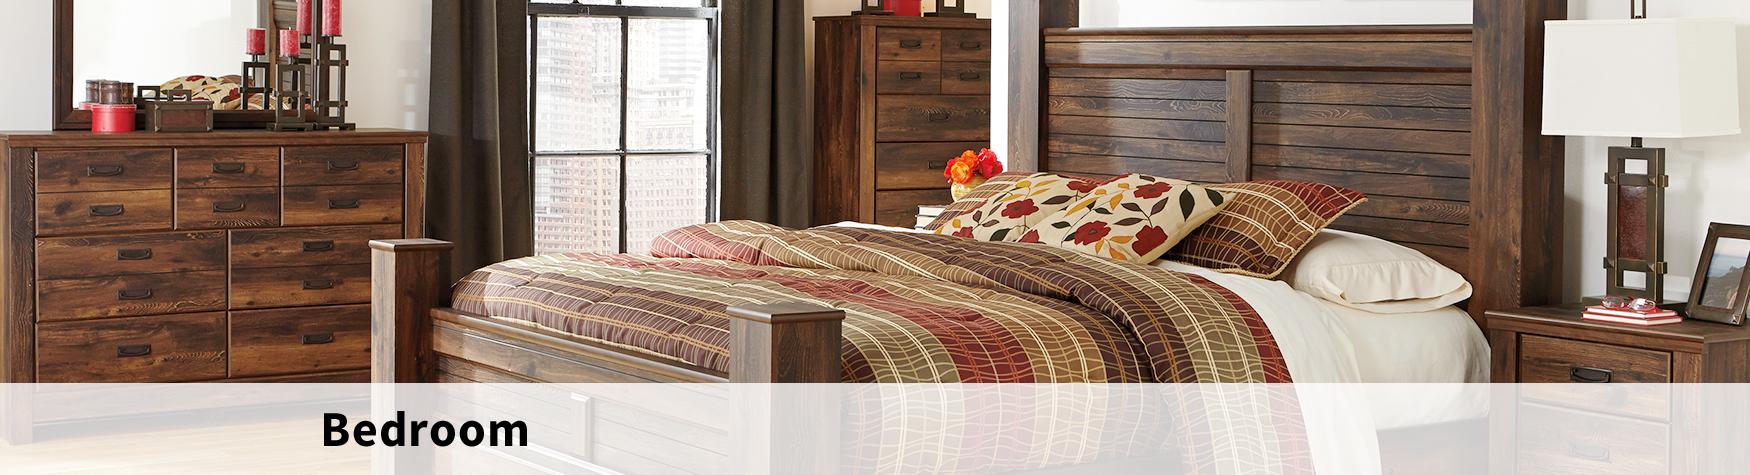 bedroom-banner.jpg